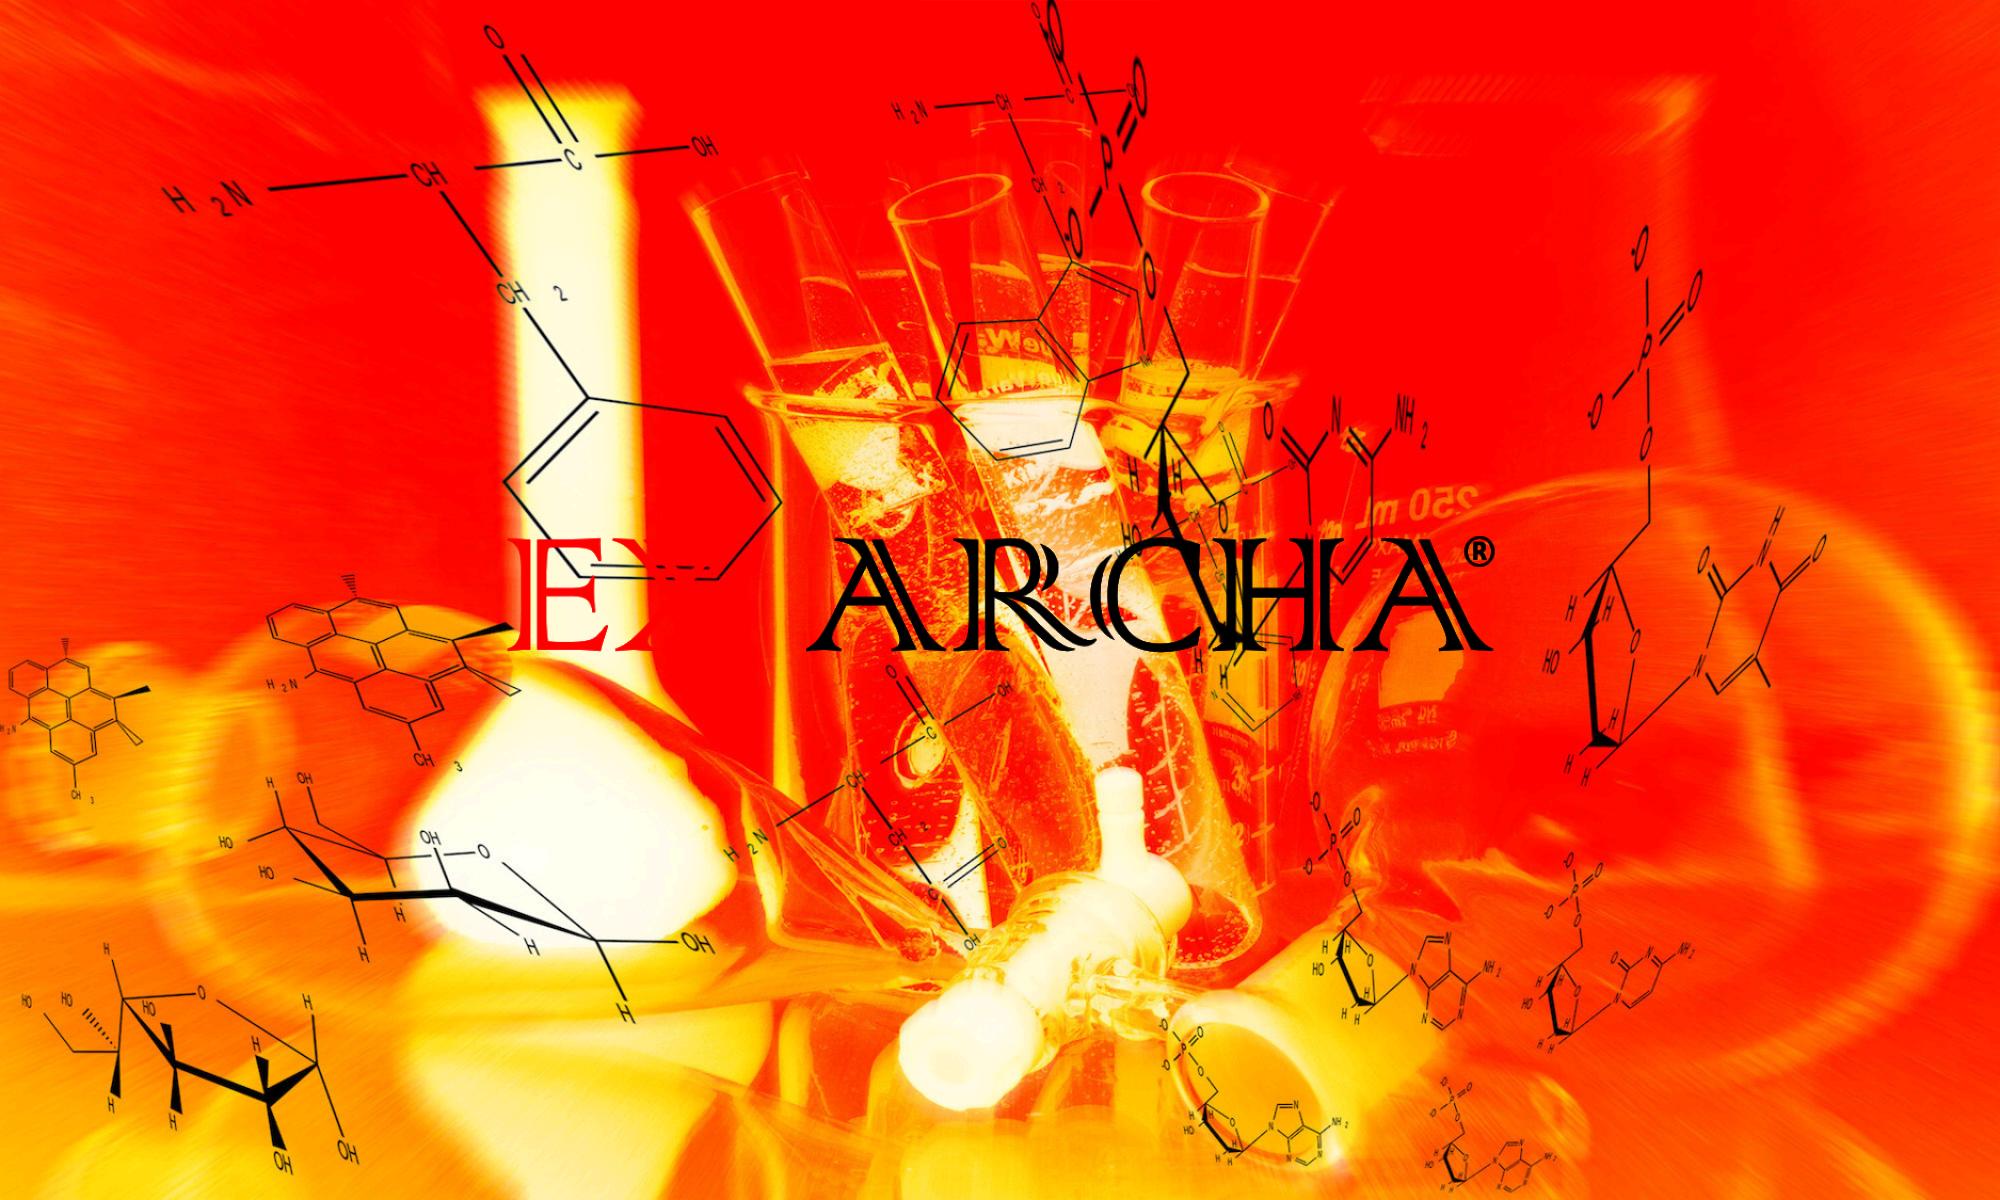 Ex Archa